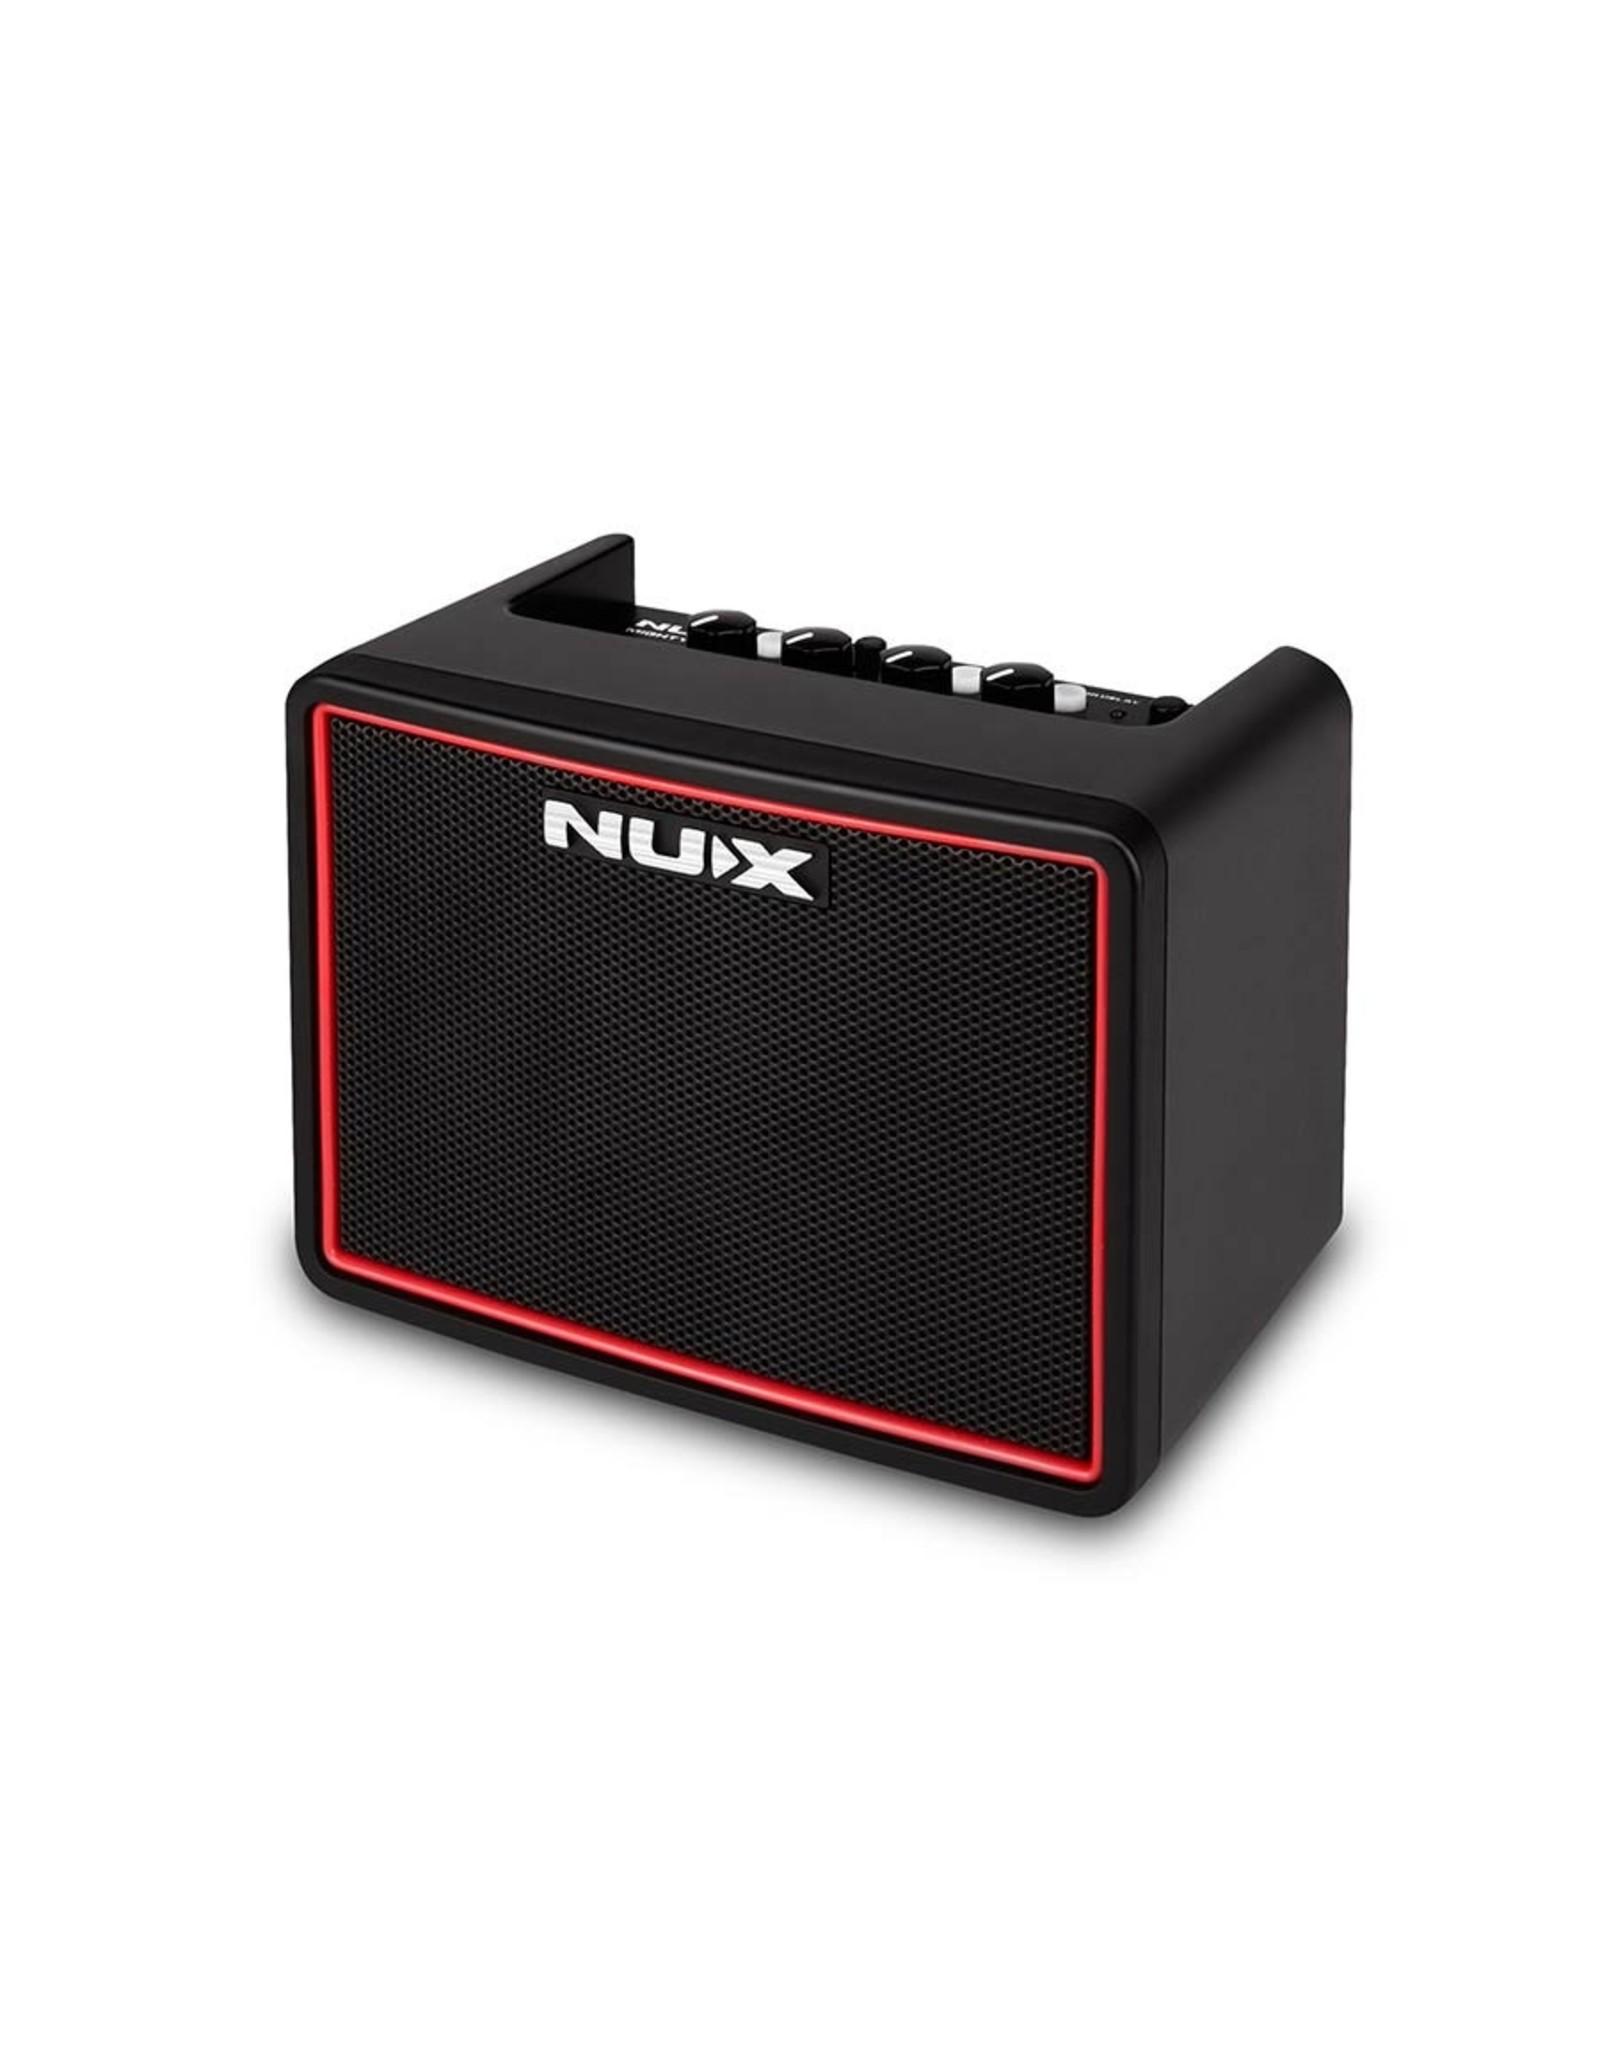 NUX Nux Mighty-LBT Desktop Amp